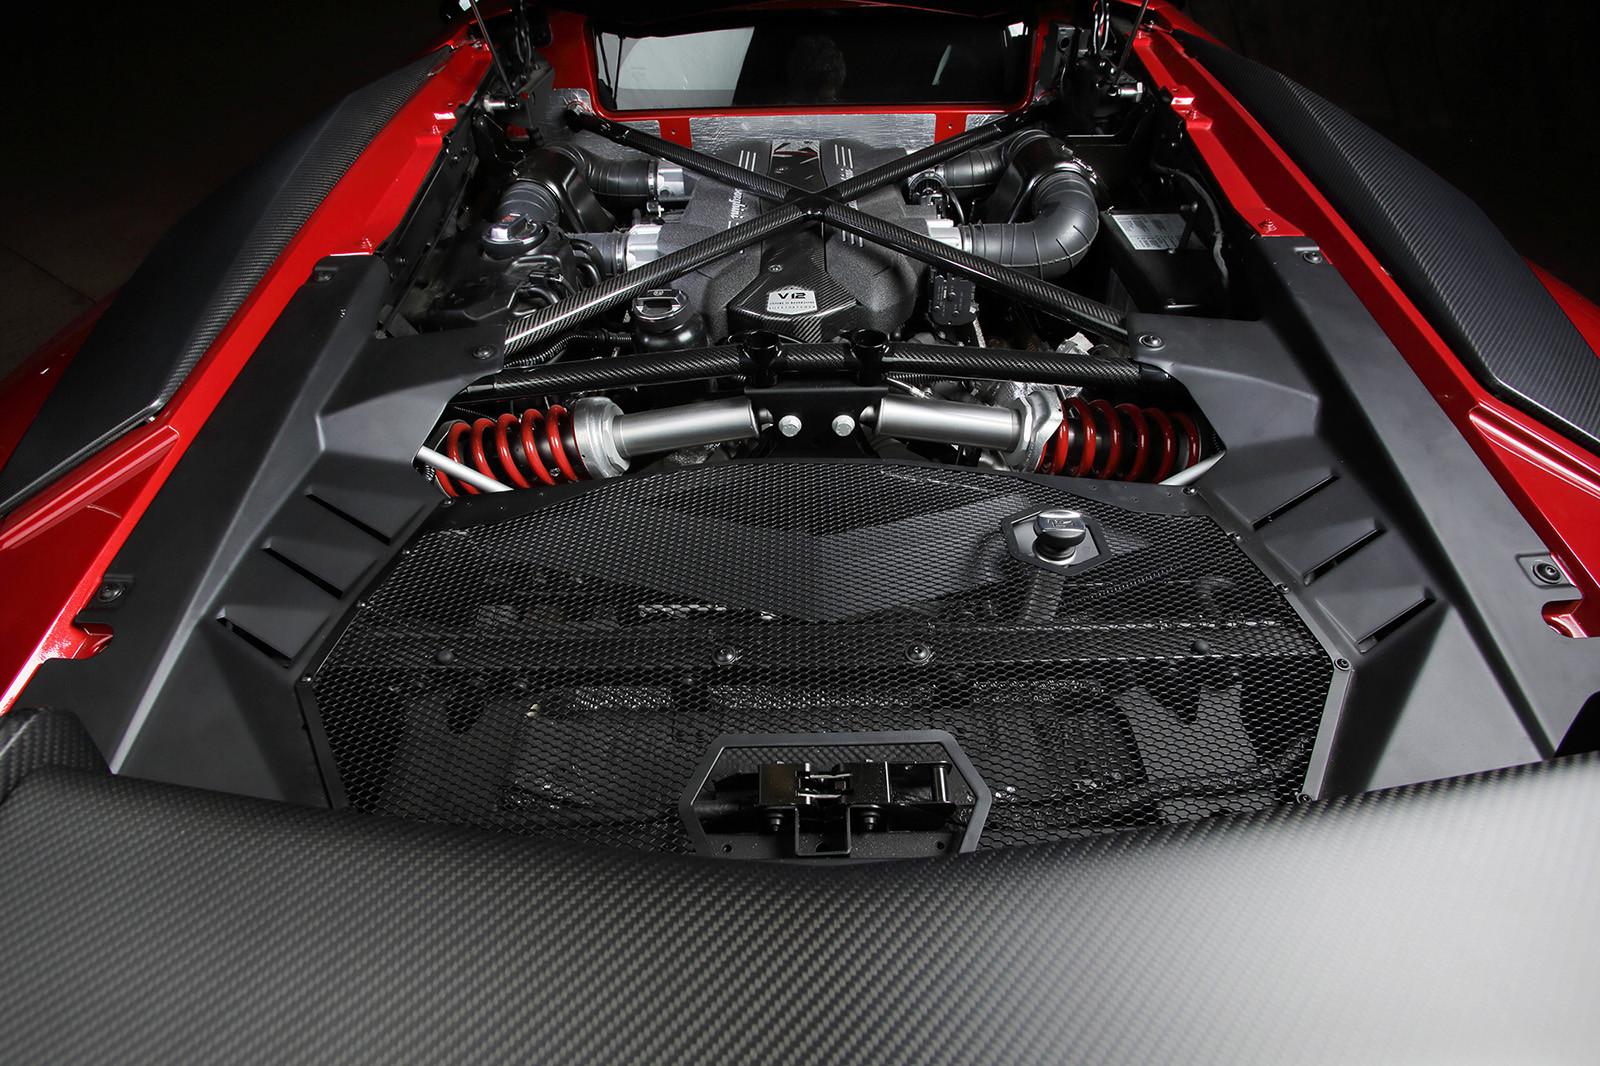 Lamborghini Aventador LP 750-4 Superveloce V12 Engine